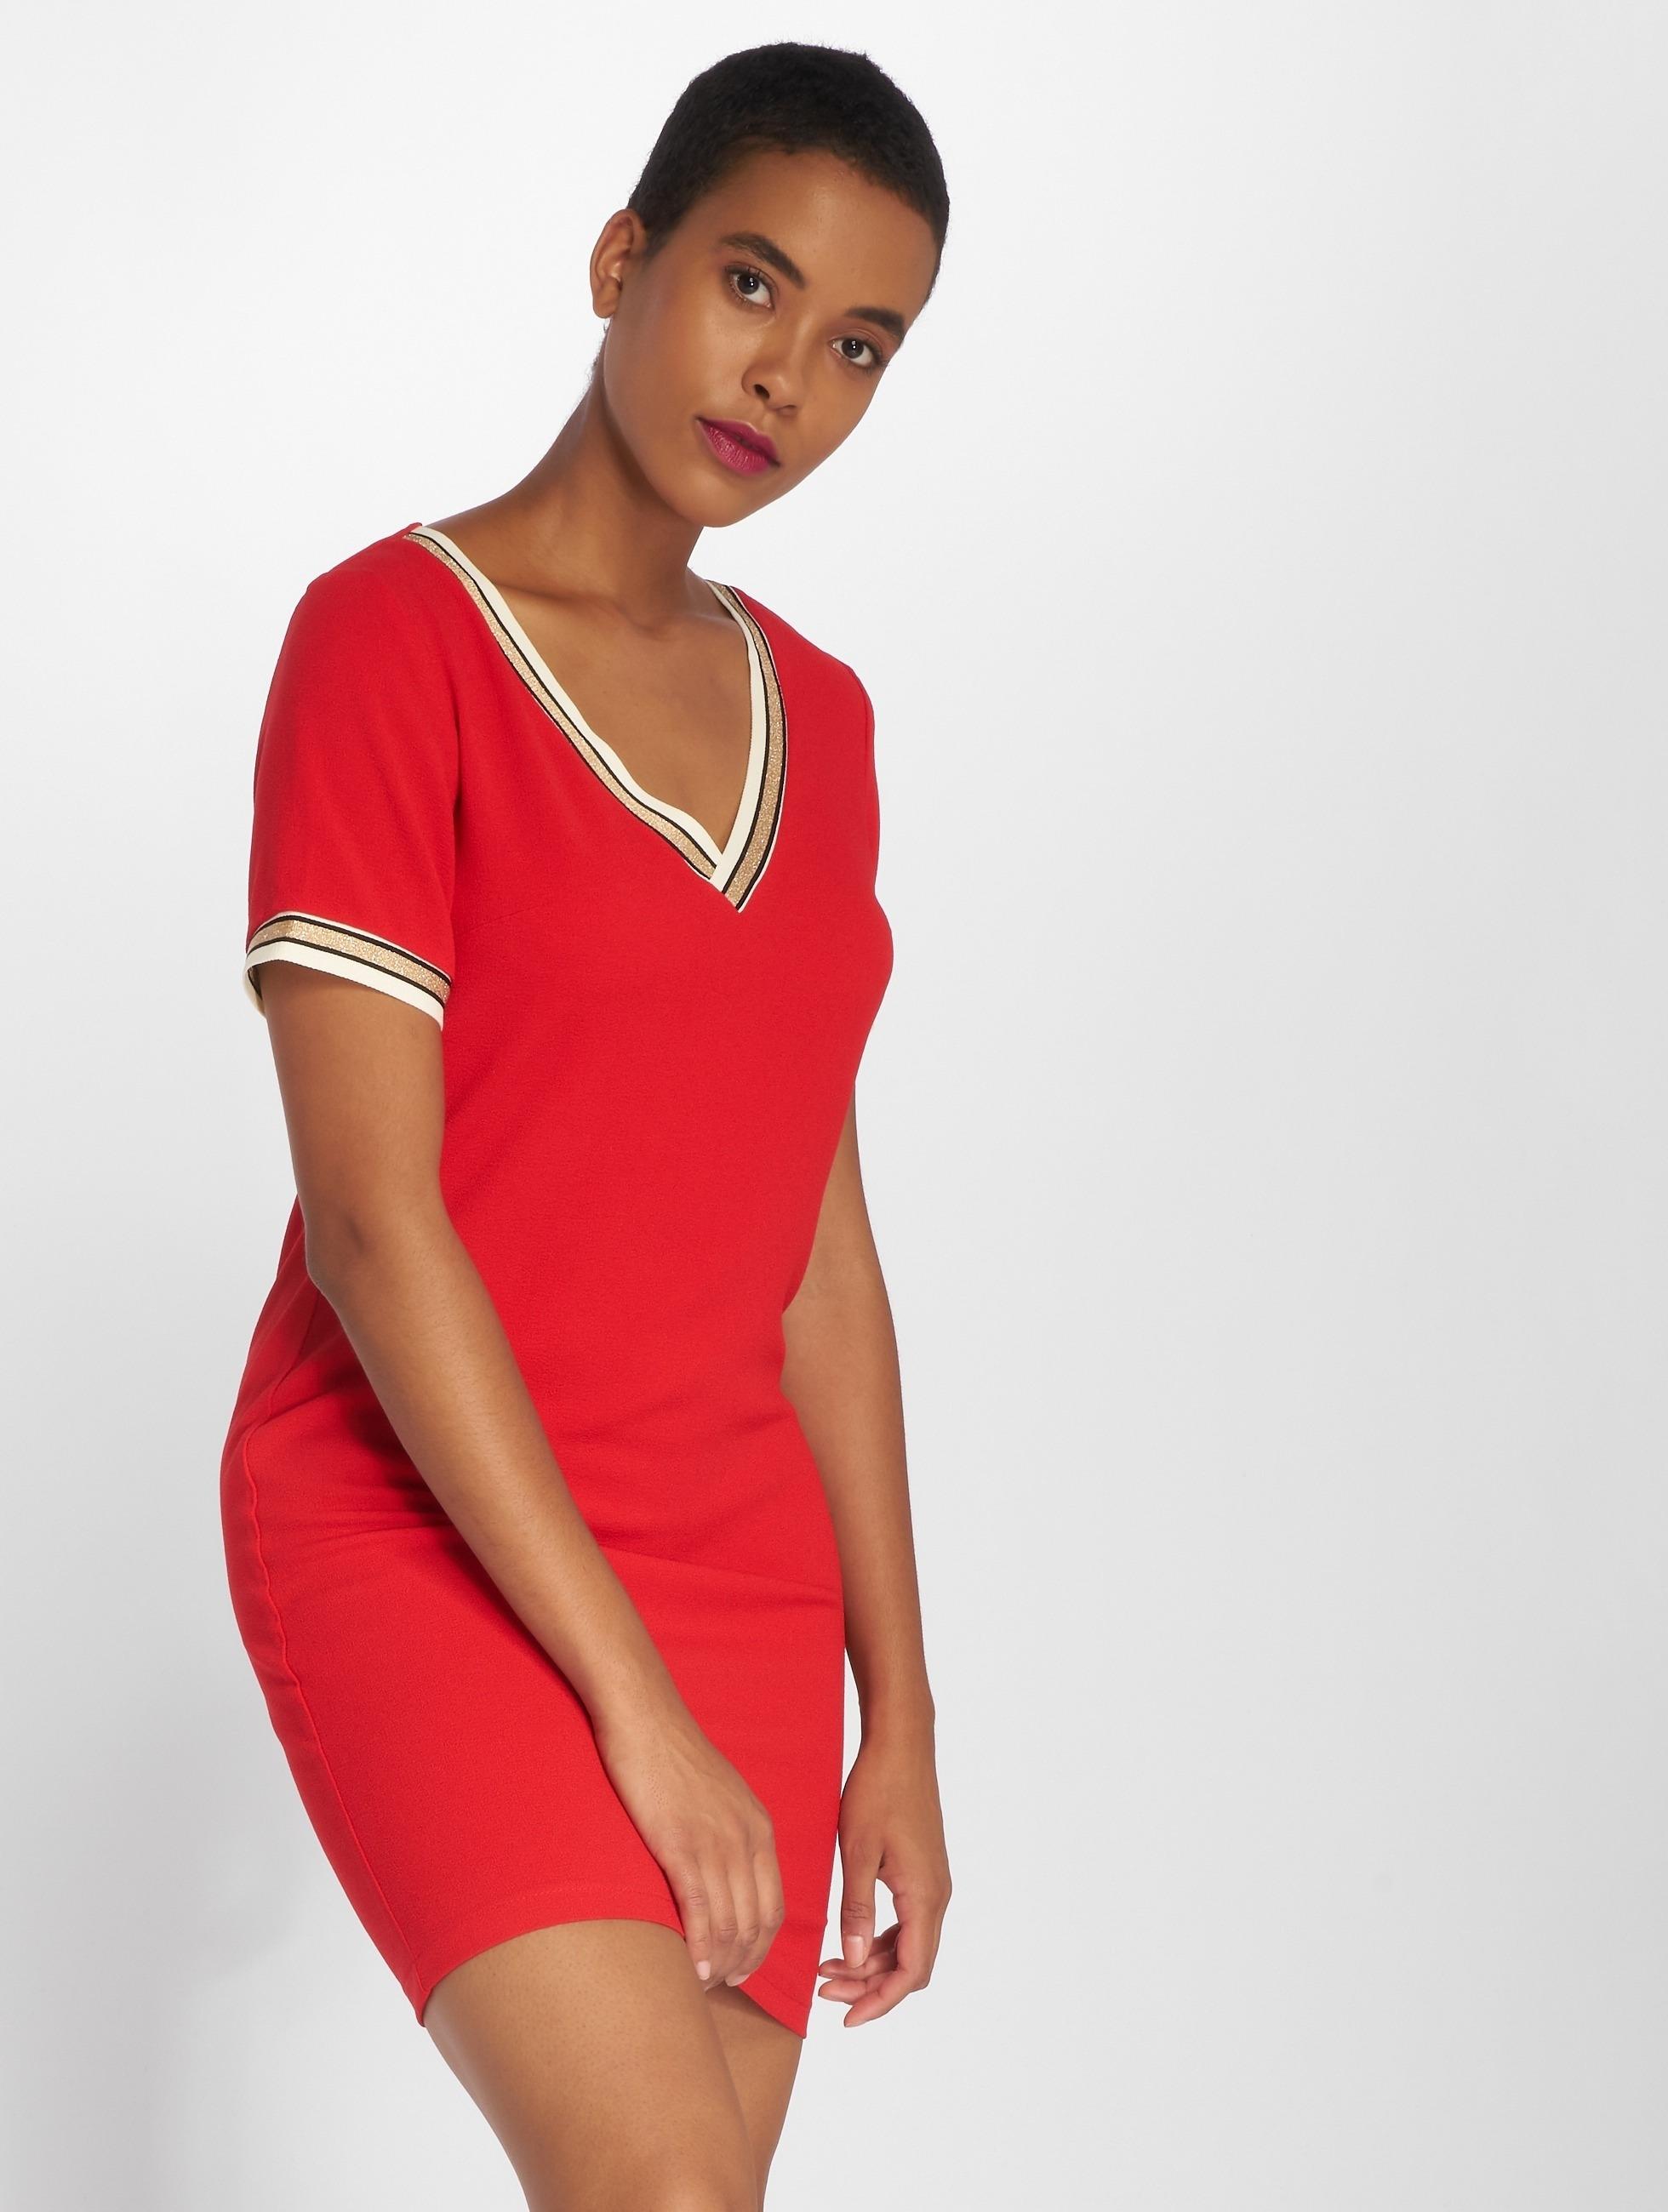 Charming Girl | Tac  rouge Femme Robe